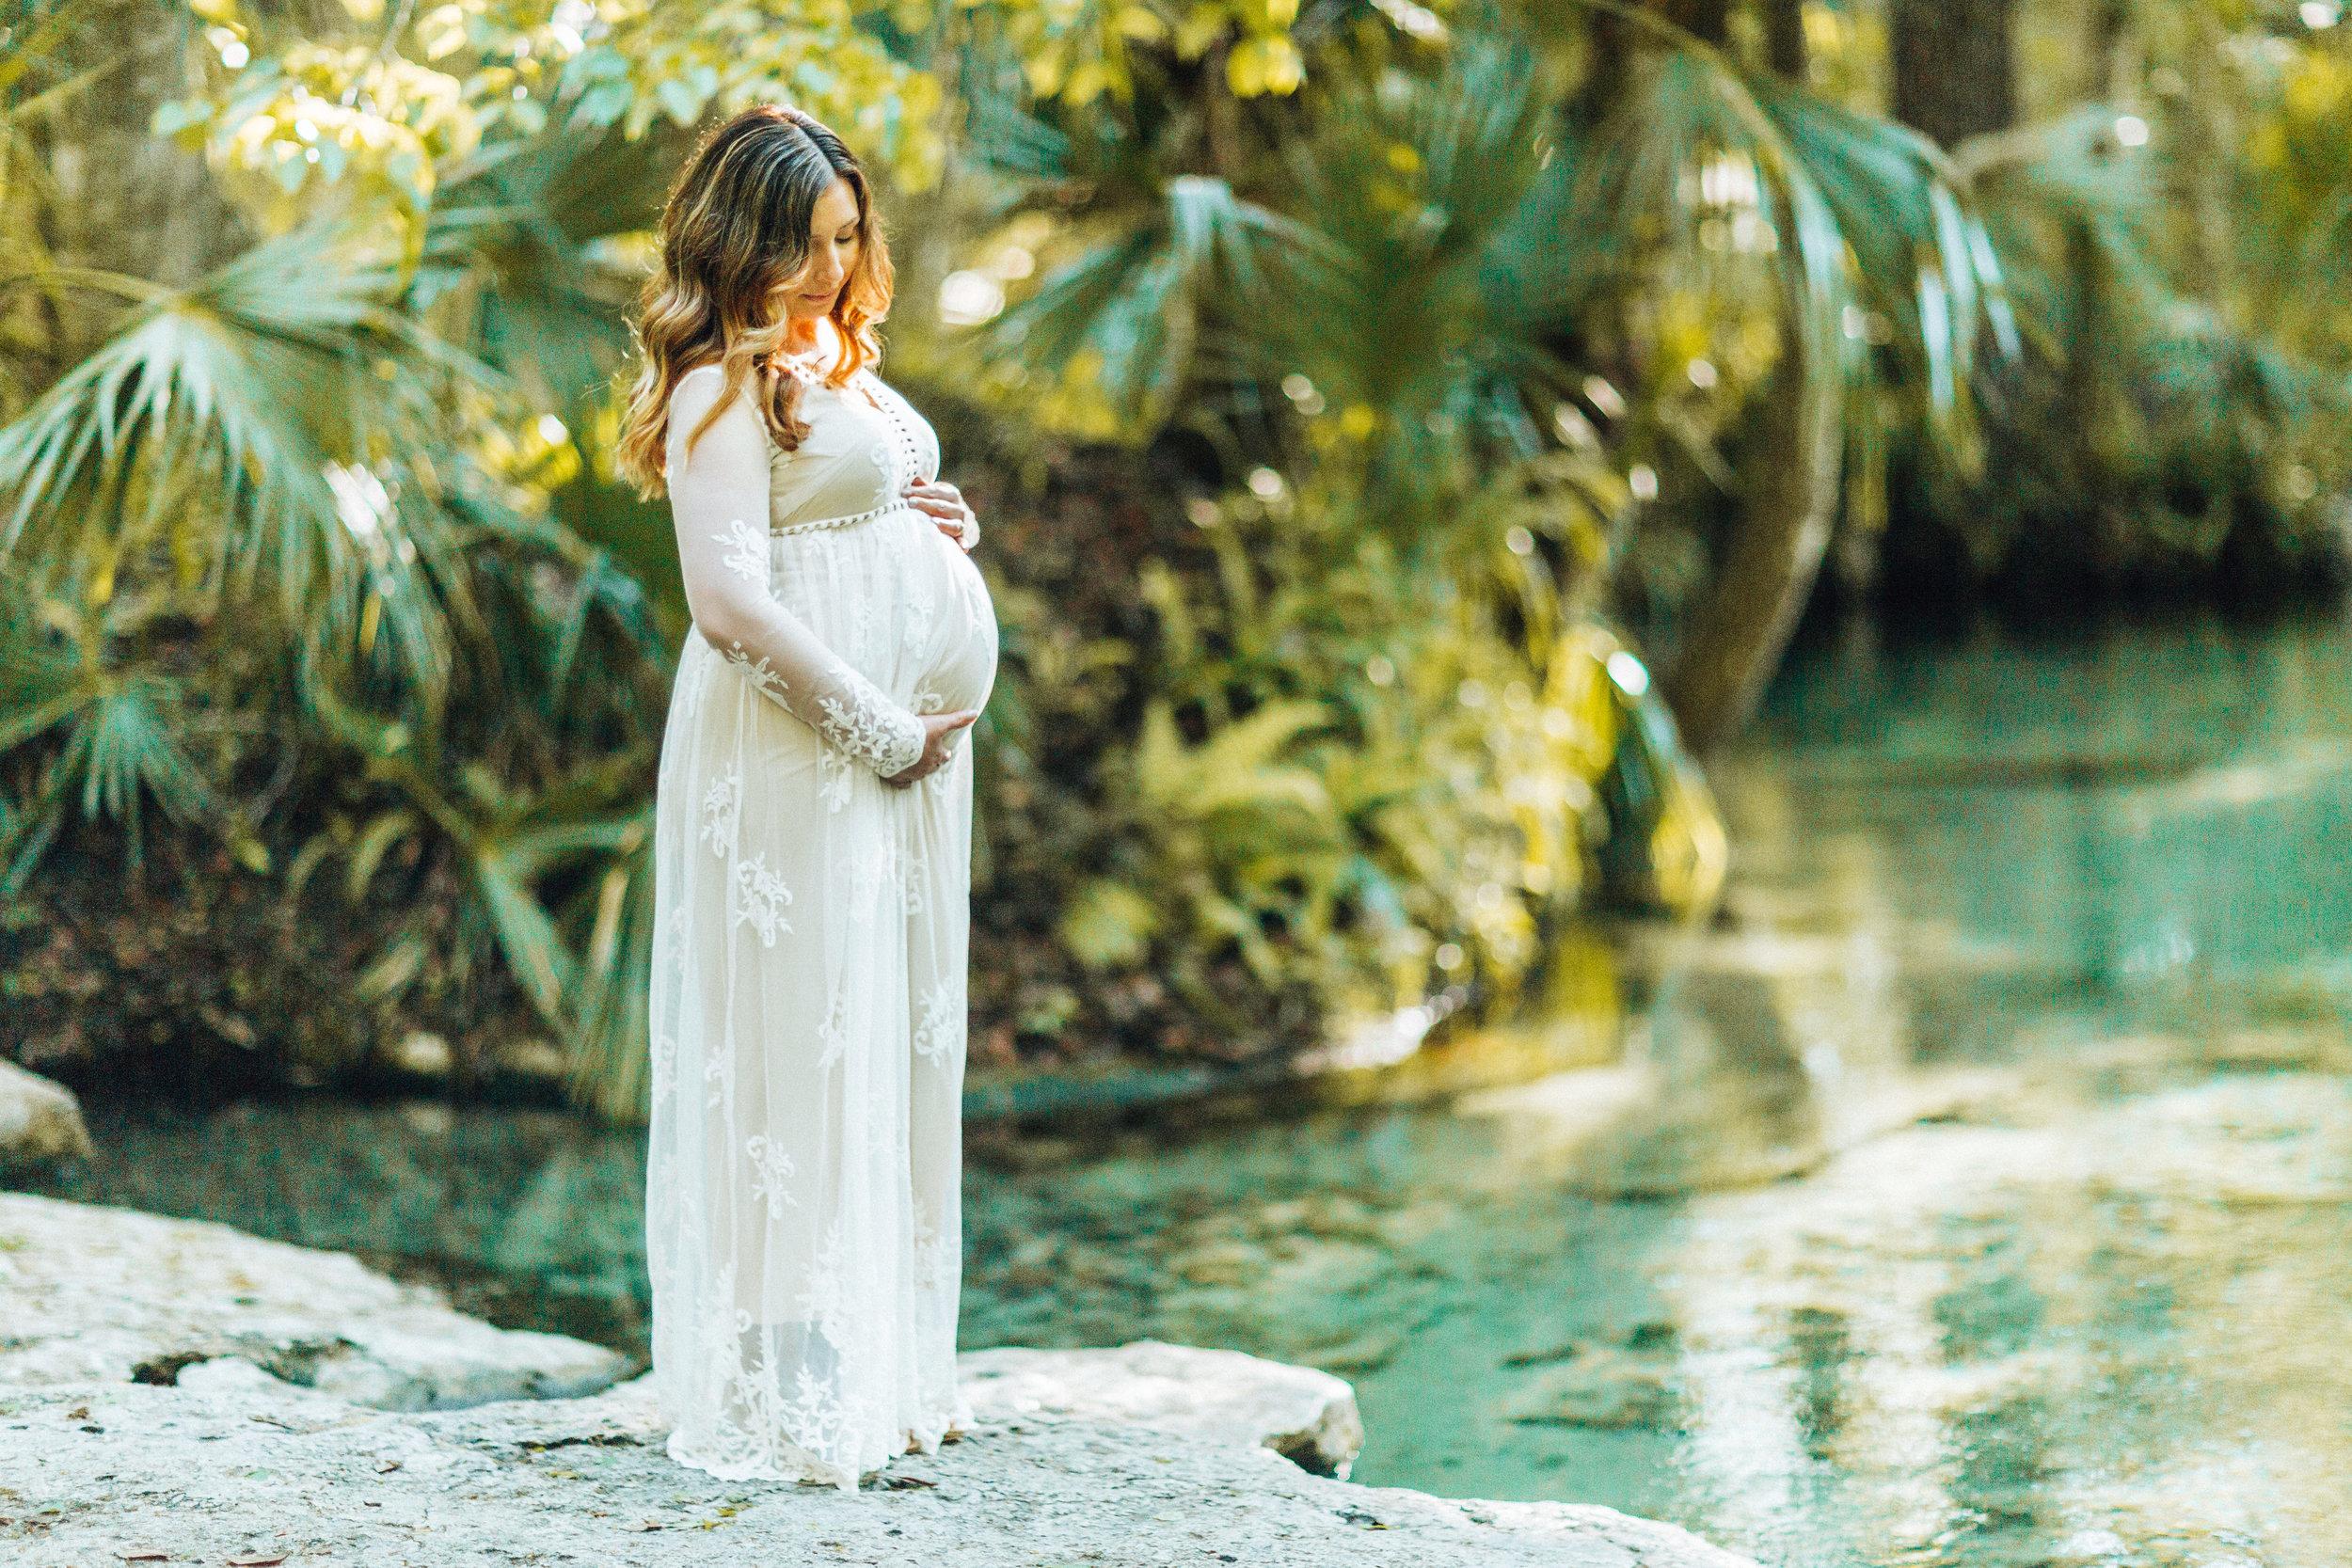 Sneak Peak-Florida Springs maternity photo session- Stephanie+Ryan- ShainaDeCiryan.com-18.jpg